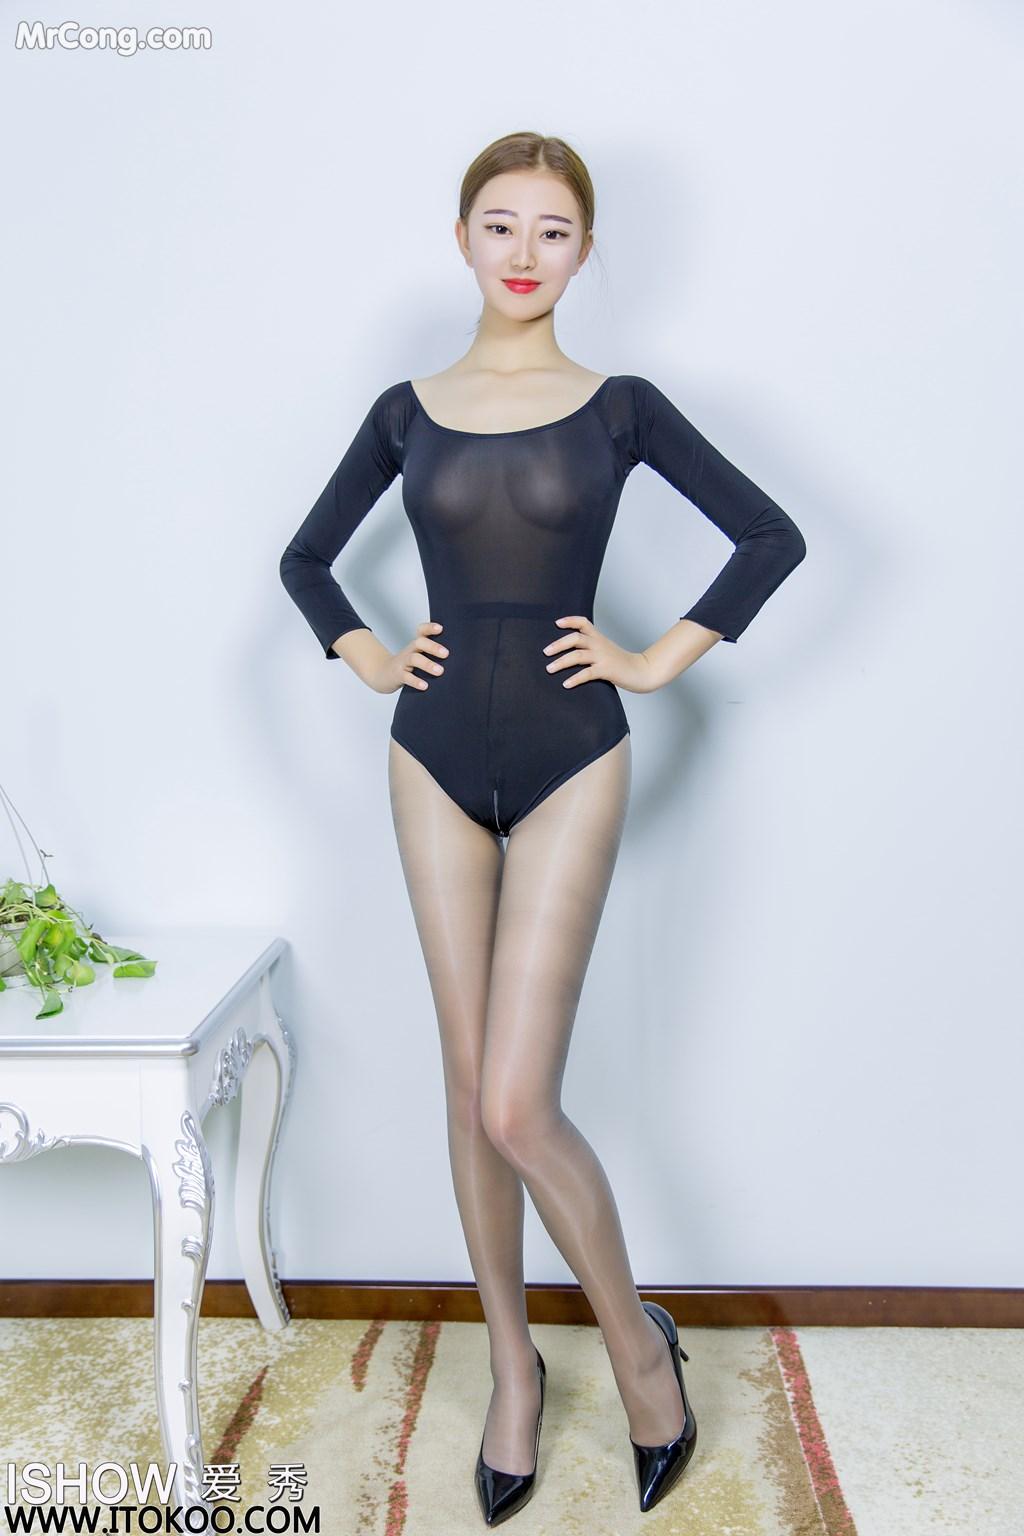 Image ISHOW-No.151-Han-Zhi-Ying-Flora-MrCong.com-001 in post ISHOW No.151: Người mẫu Han Zhi Ying (寒栀樱Flora) (31 ảnh)